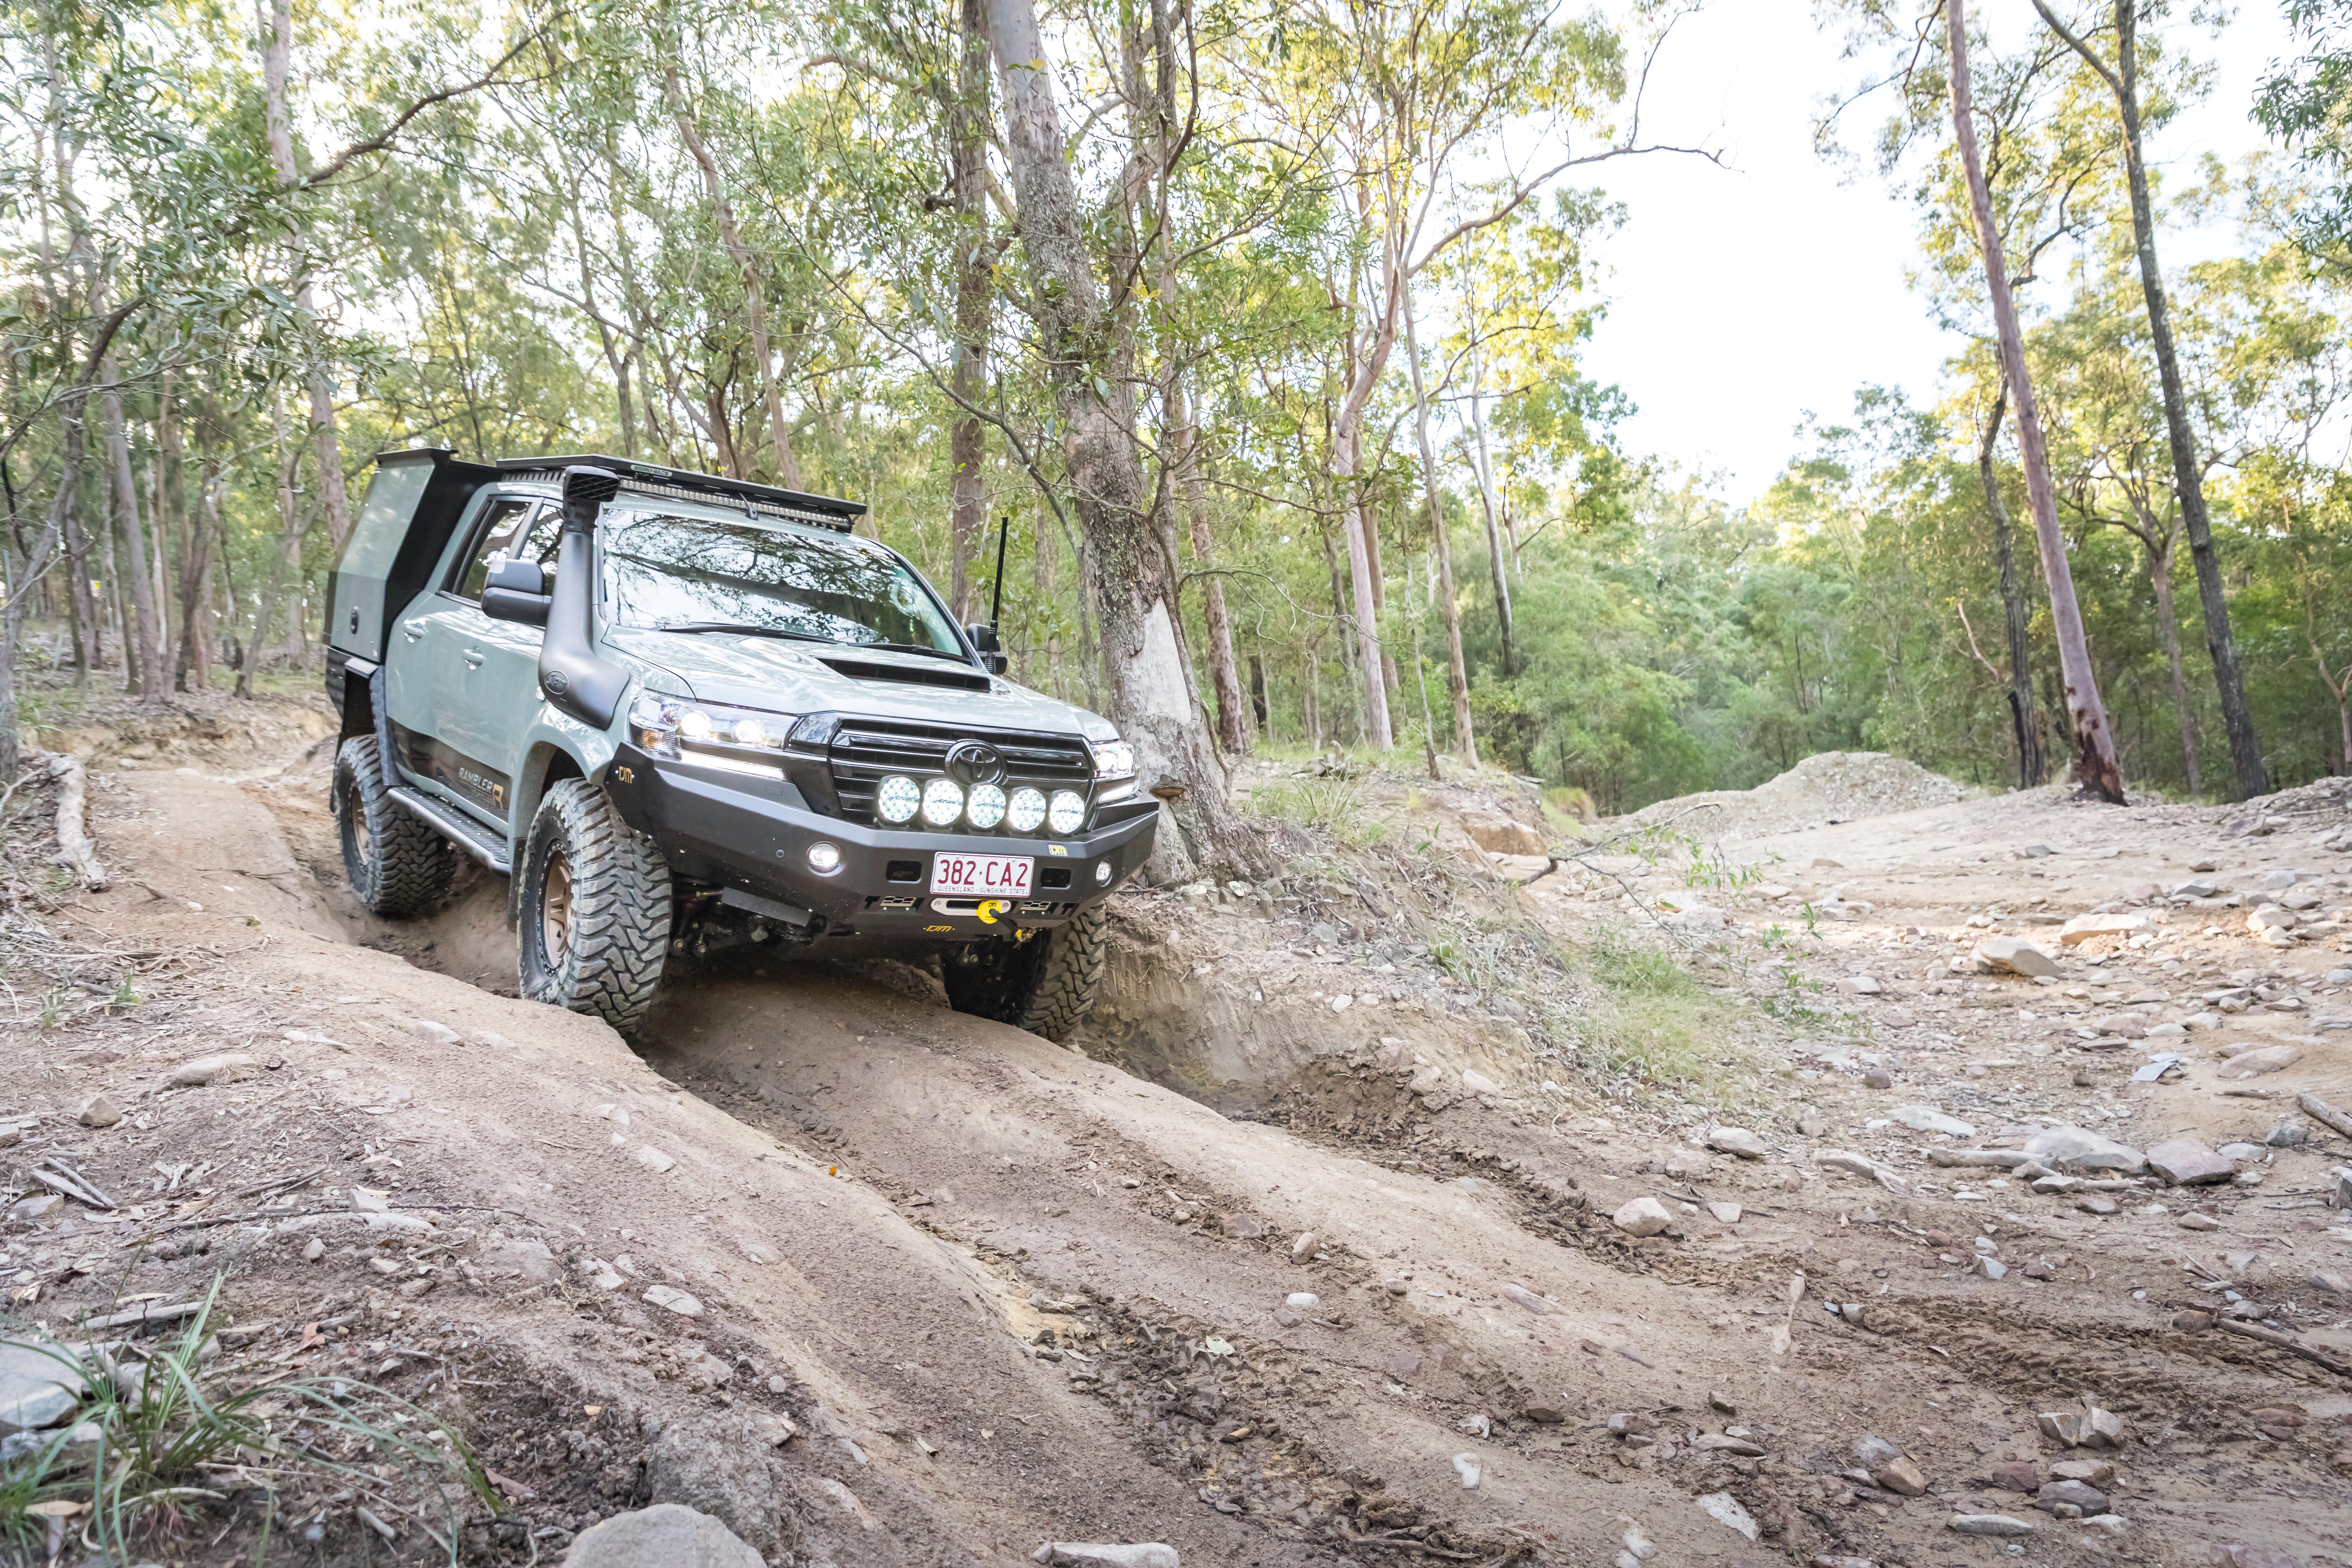 4 X 4 Australia Reviews 2021 September 2021 Rambler Vehicles Toyota Land Cruiser 200 Series 39